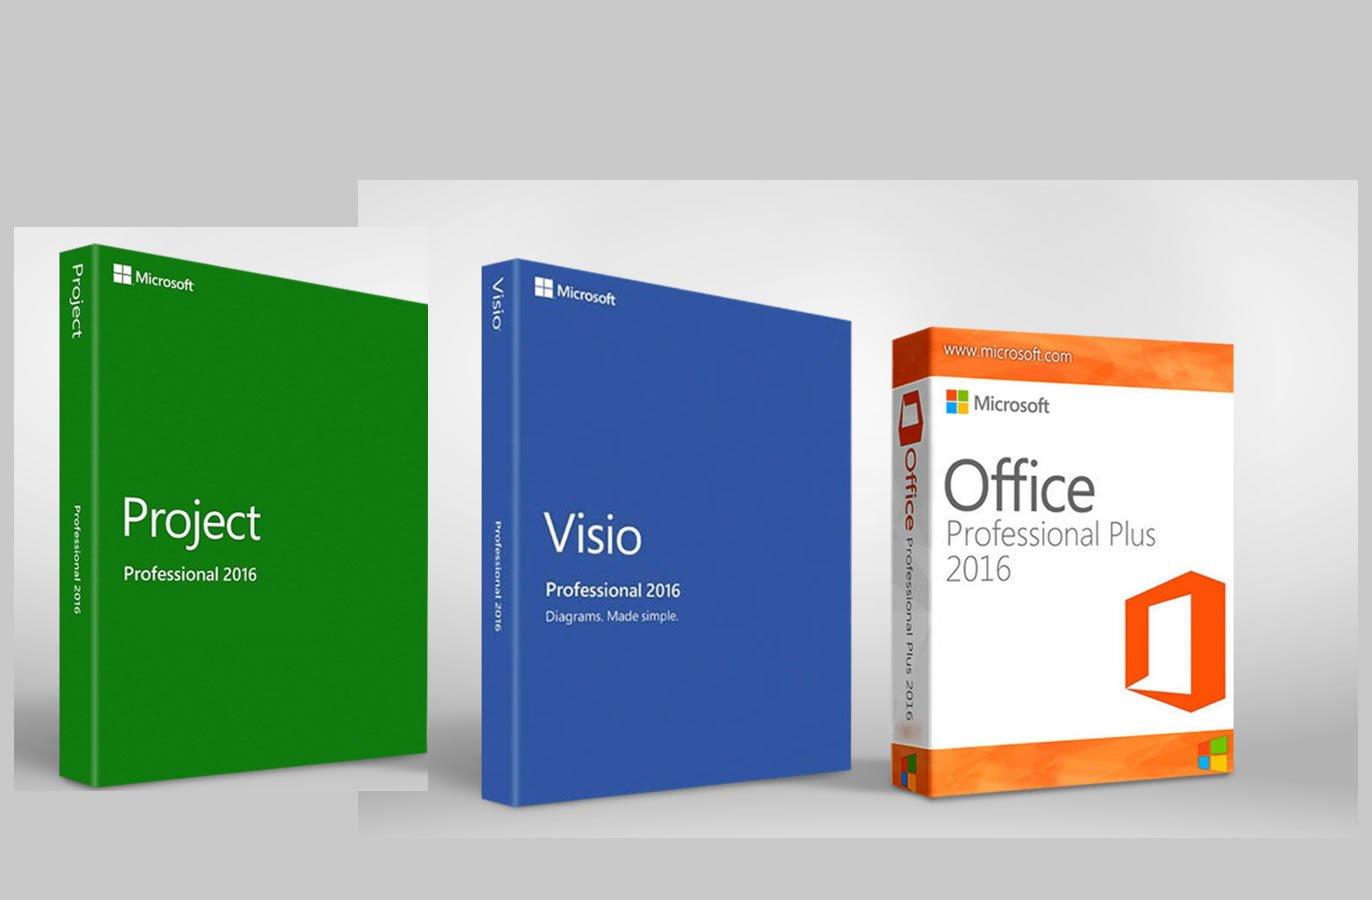 Microsoft Office 2016 Pro Plus + Microsoft Project 2016 Pro + Visio Pro 2016 Key